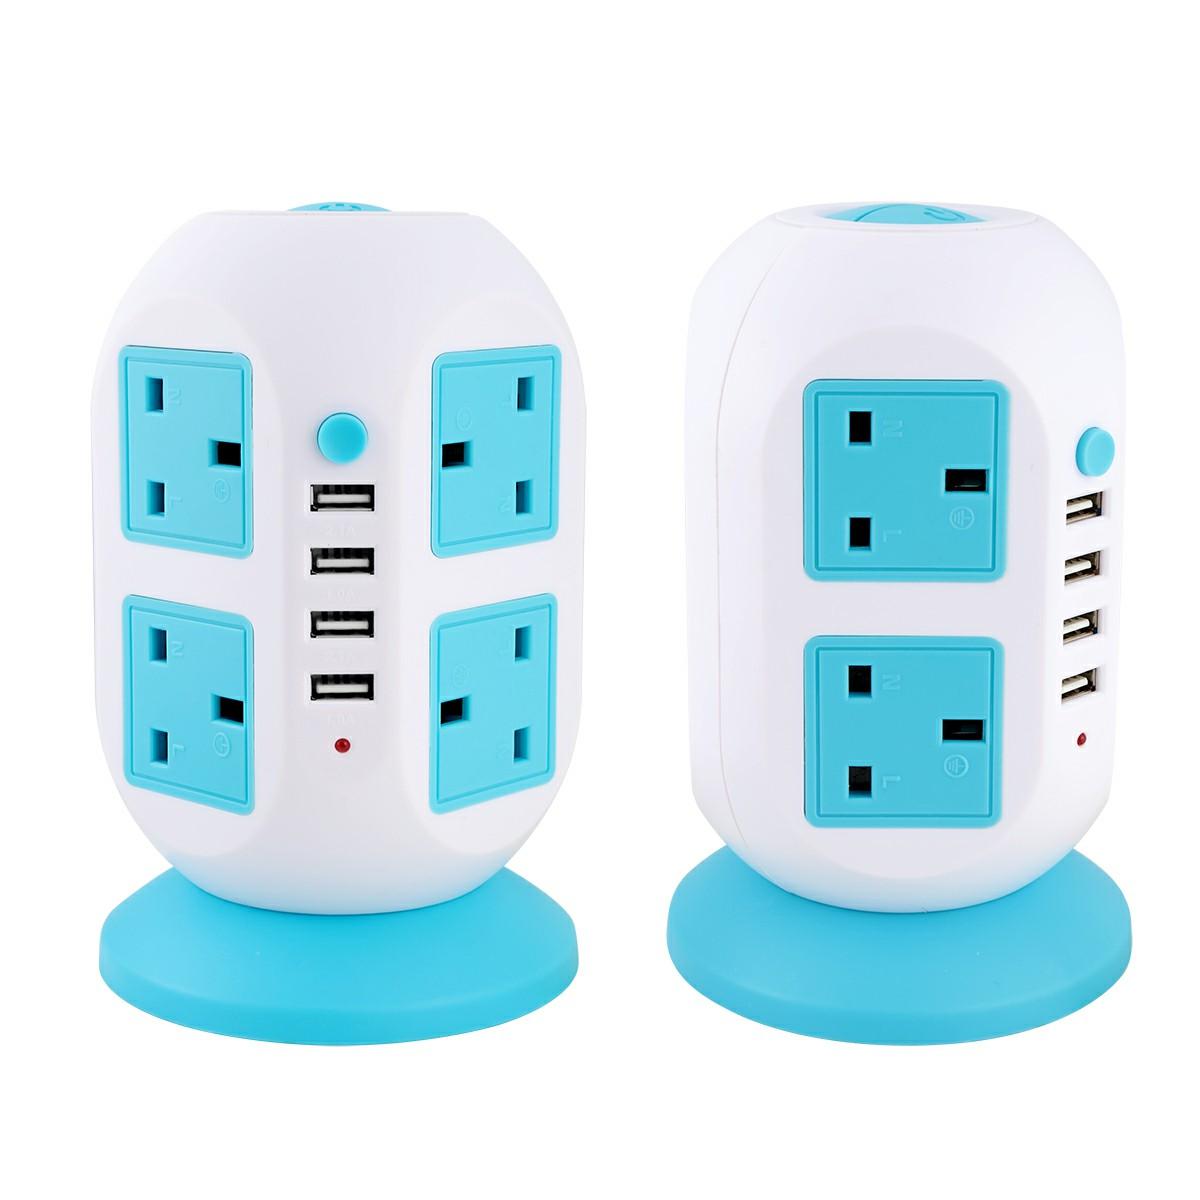 UK Plug Power Strip 8-AC Outlets 4-Port USB Ports Charger Plug - Blue